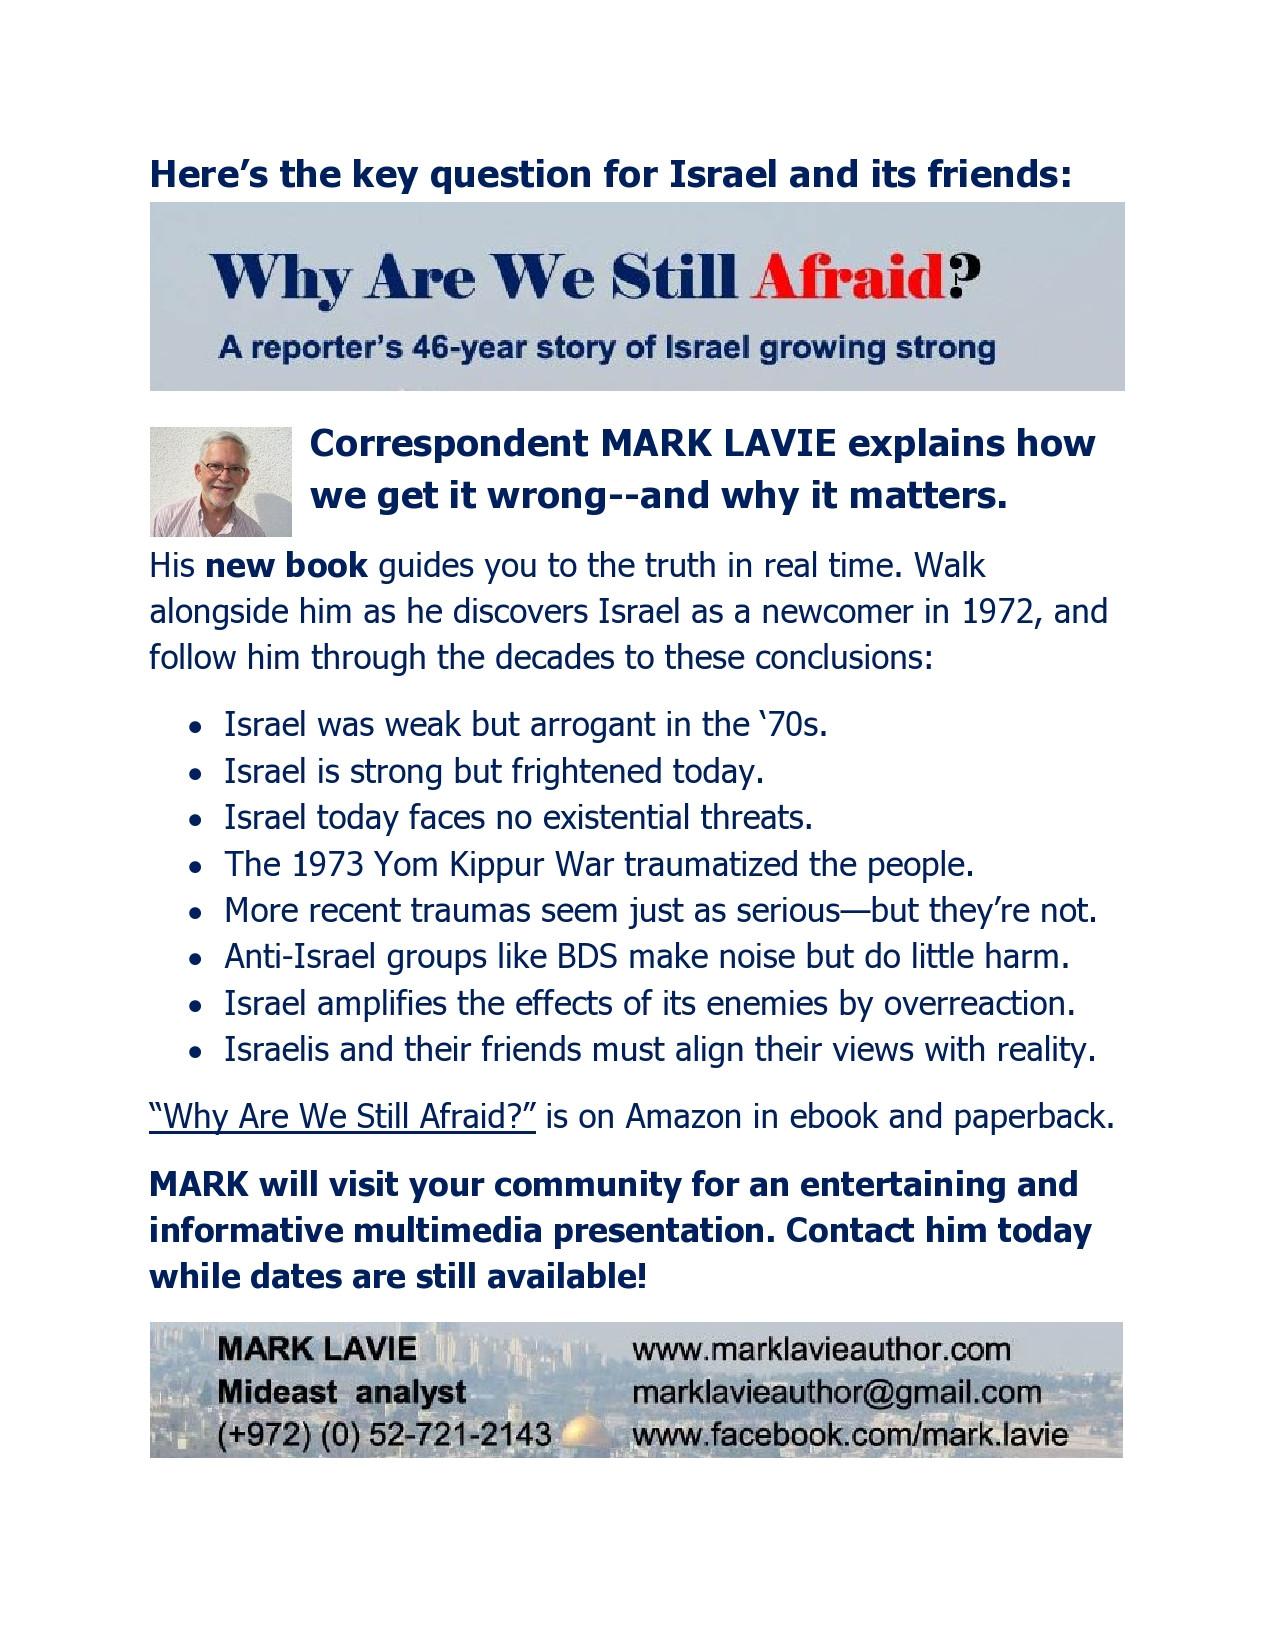 Invite Mark to your community!